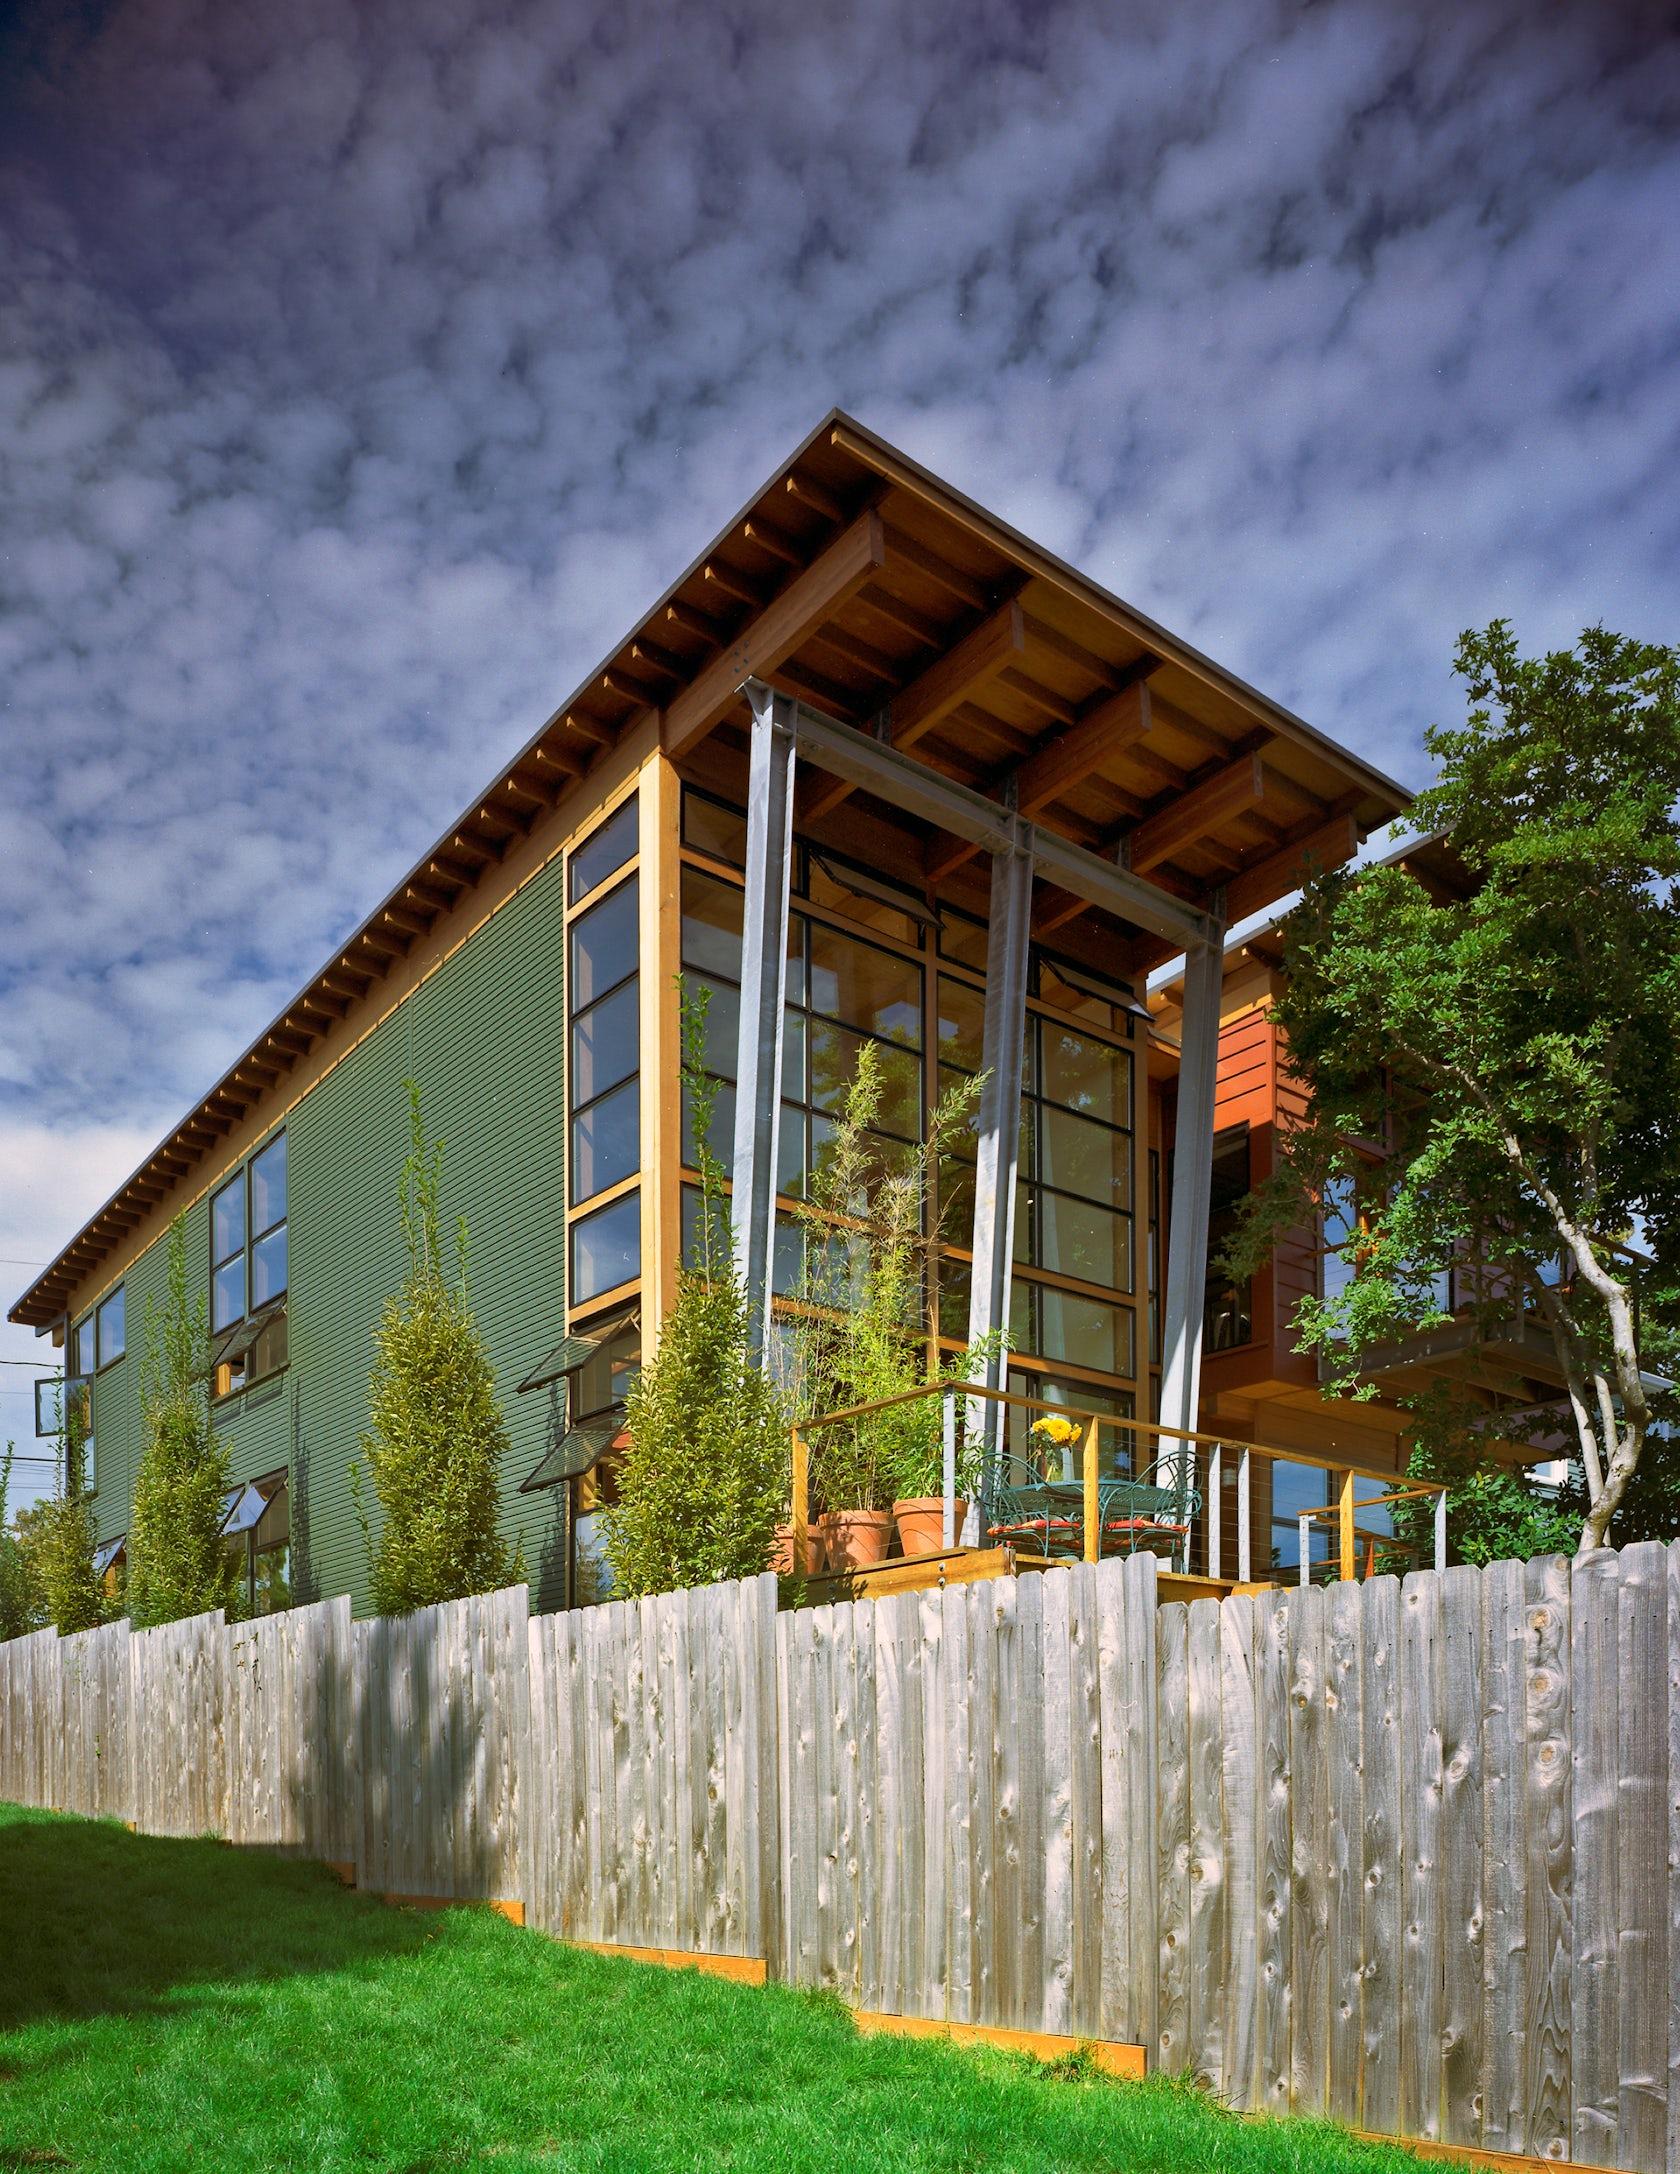 scott edwards architecture architizer. Black Bedroom Furniture Sets. Home Design Ideas